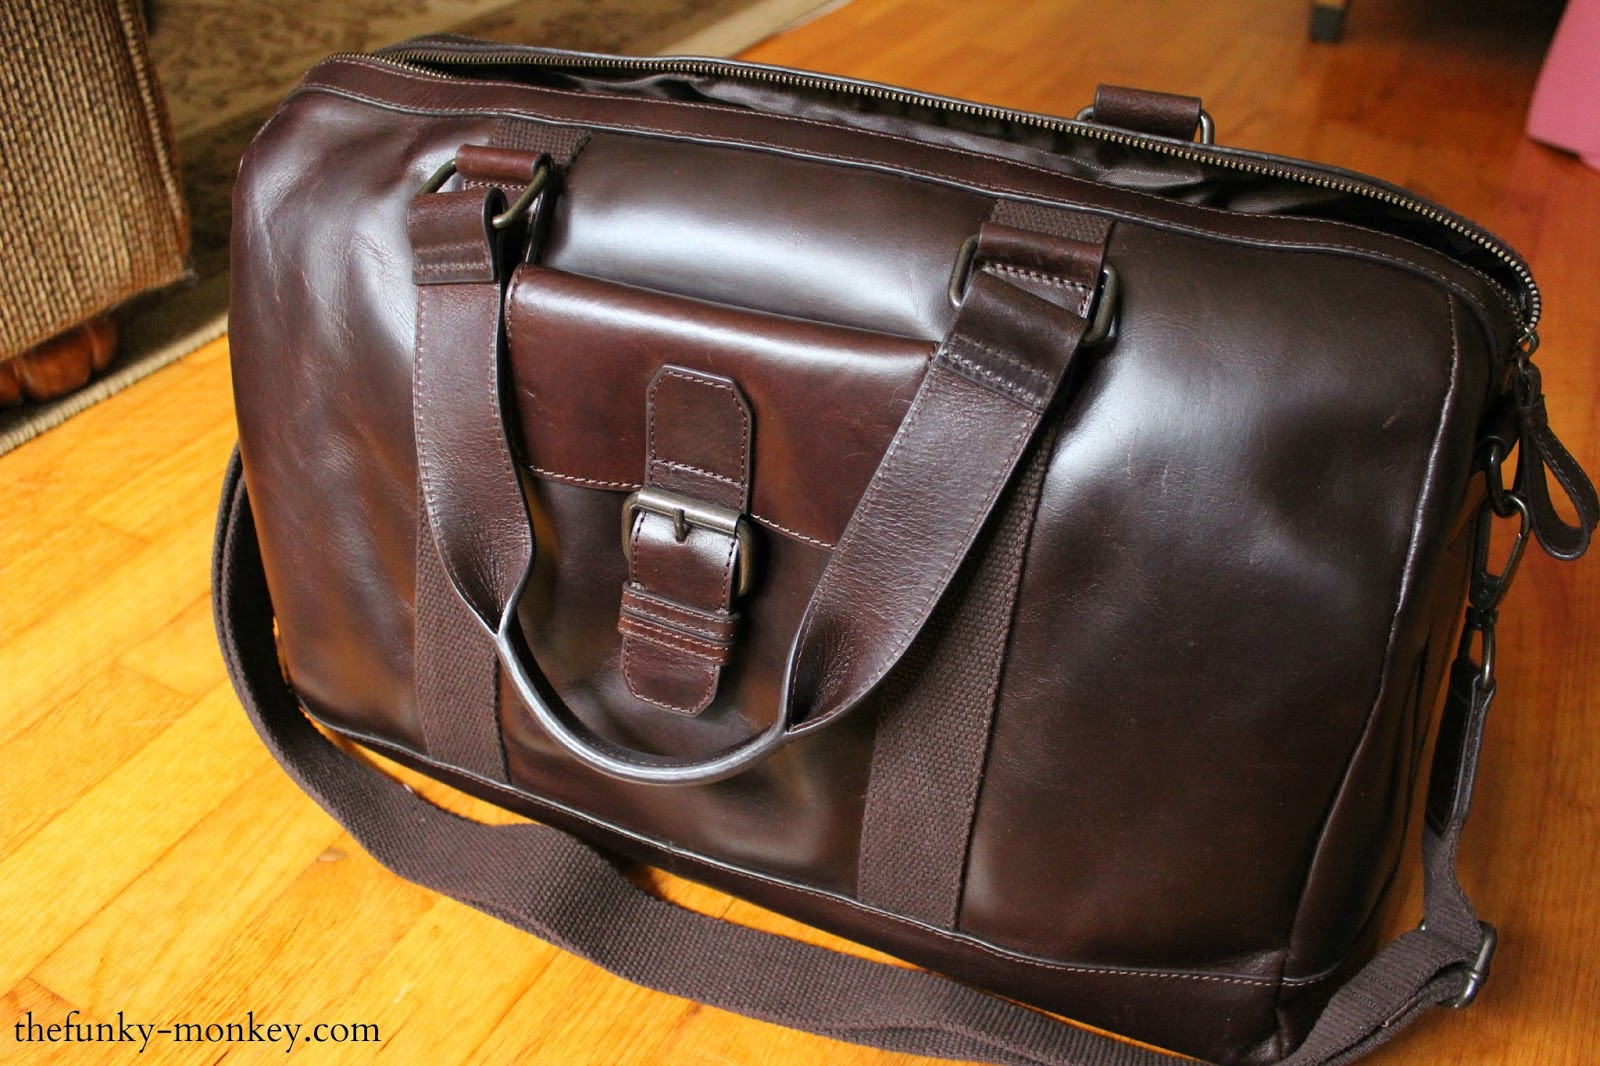 The Funky Monkey Wilsons Leather Dakota Zip Closure Duffel Bag